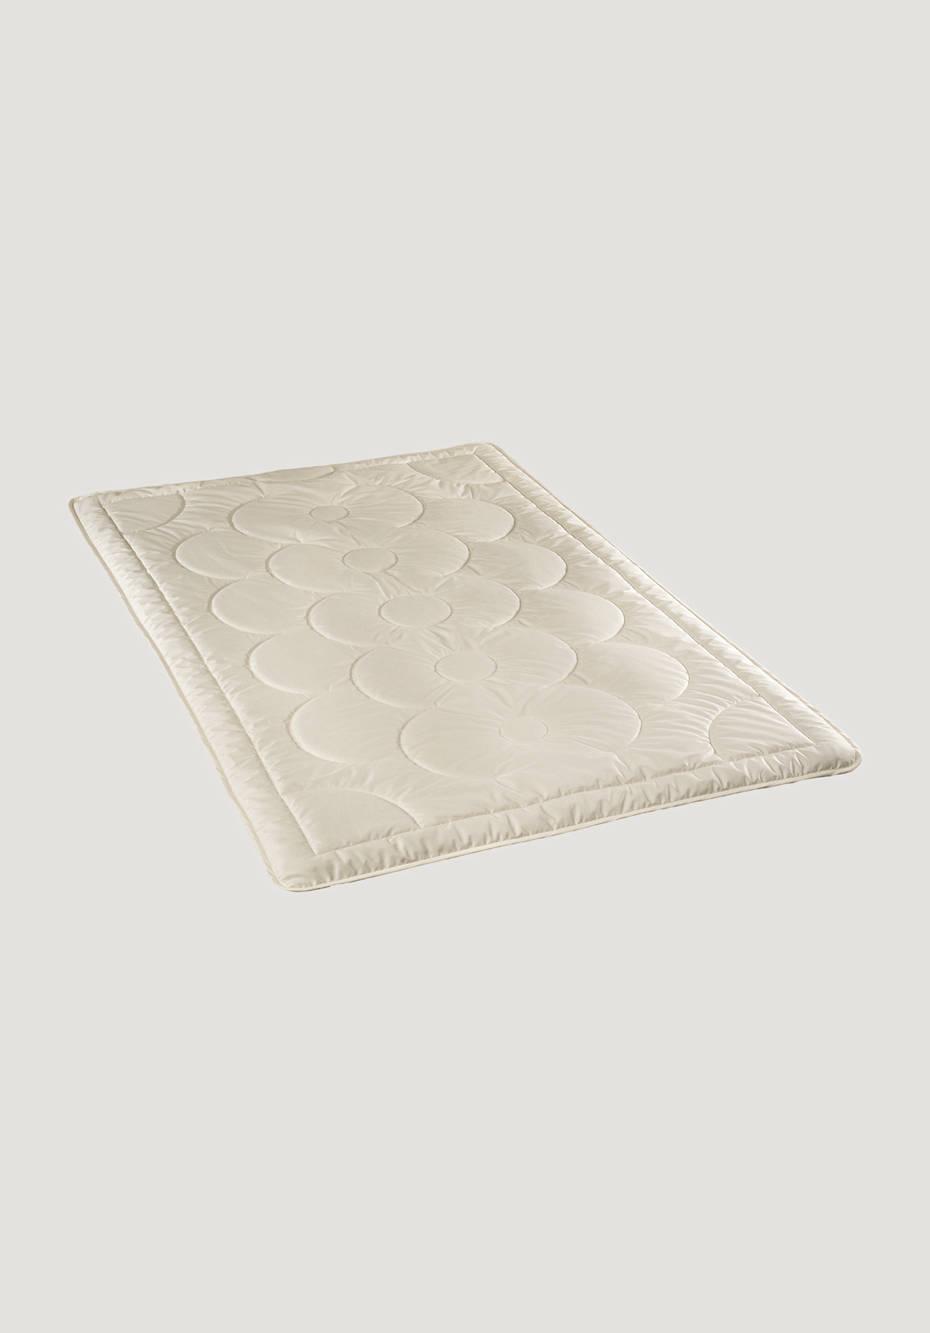 Tussah silk summer blanket